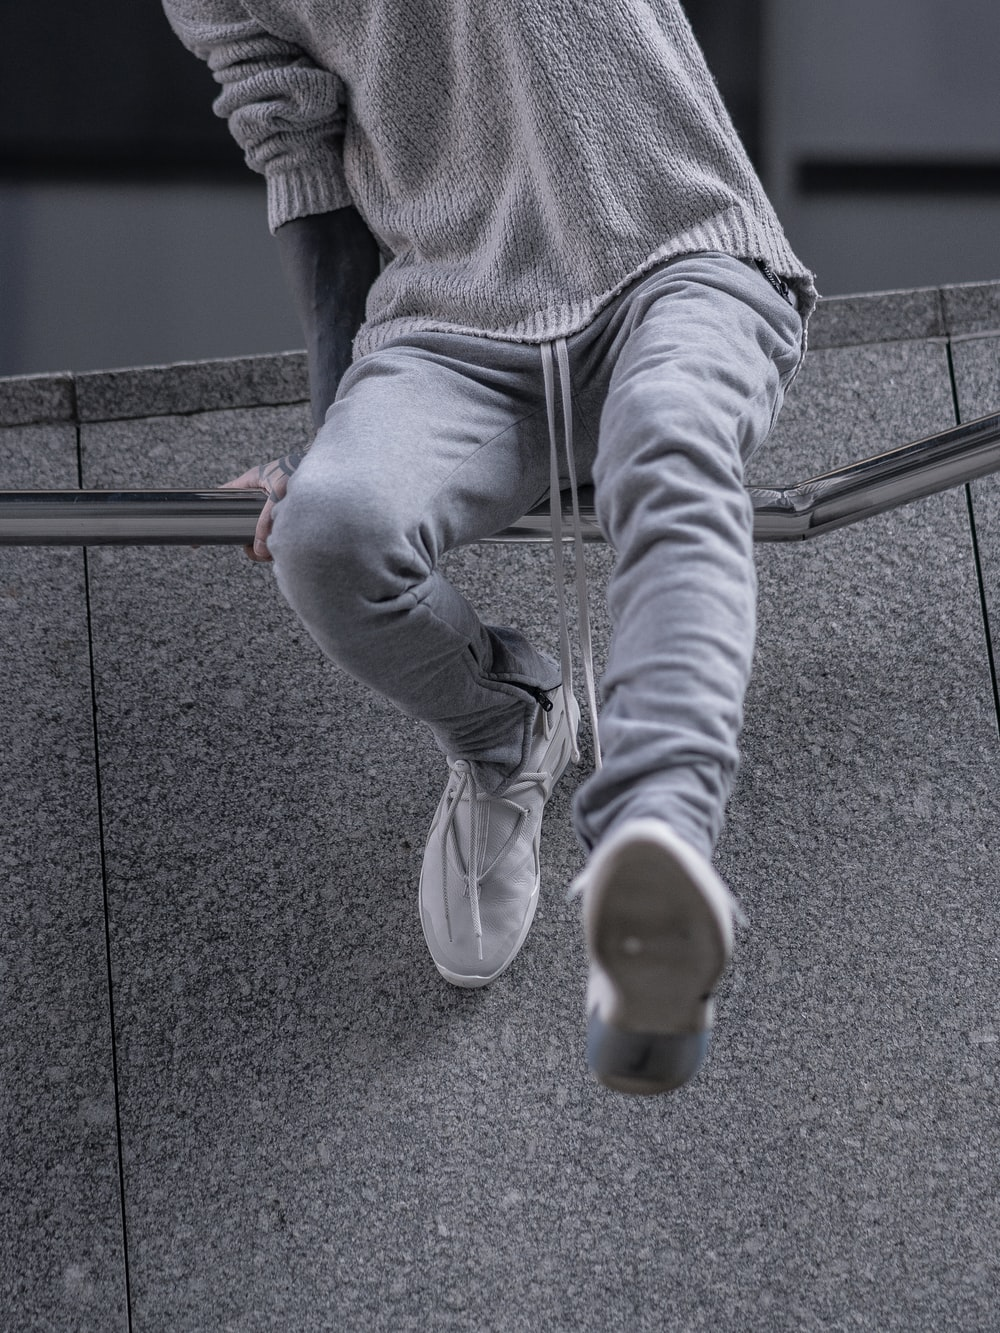 person wearing gray track pants and gray long-sleeved shirt mid air jump